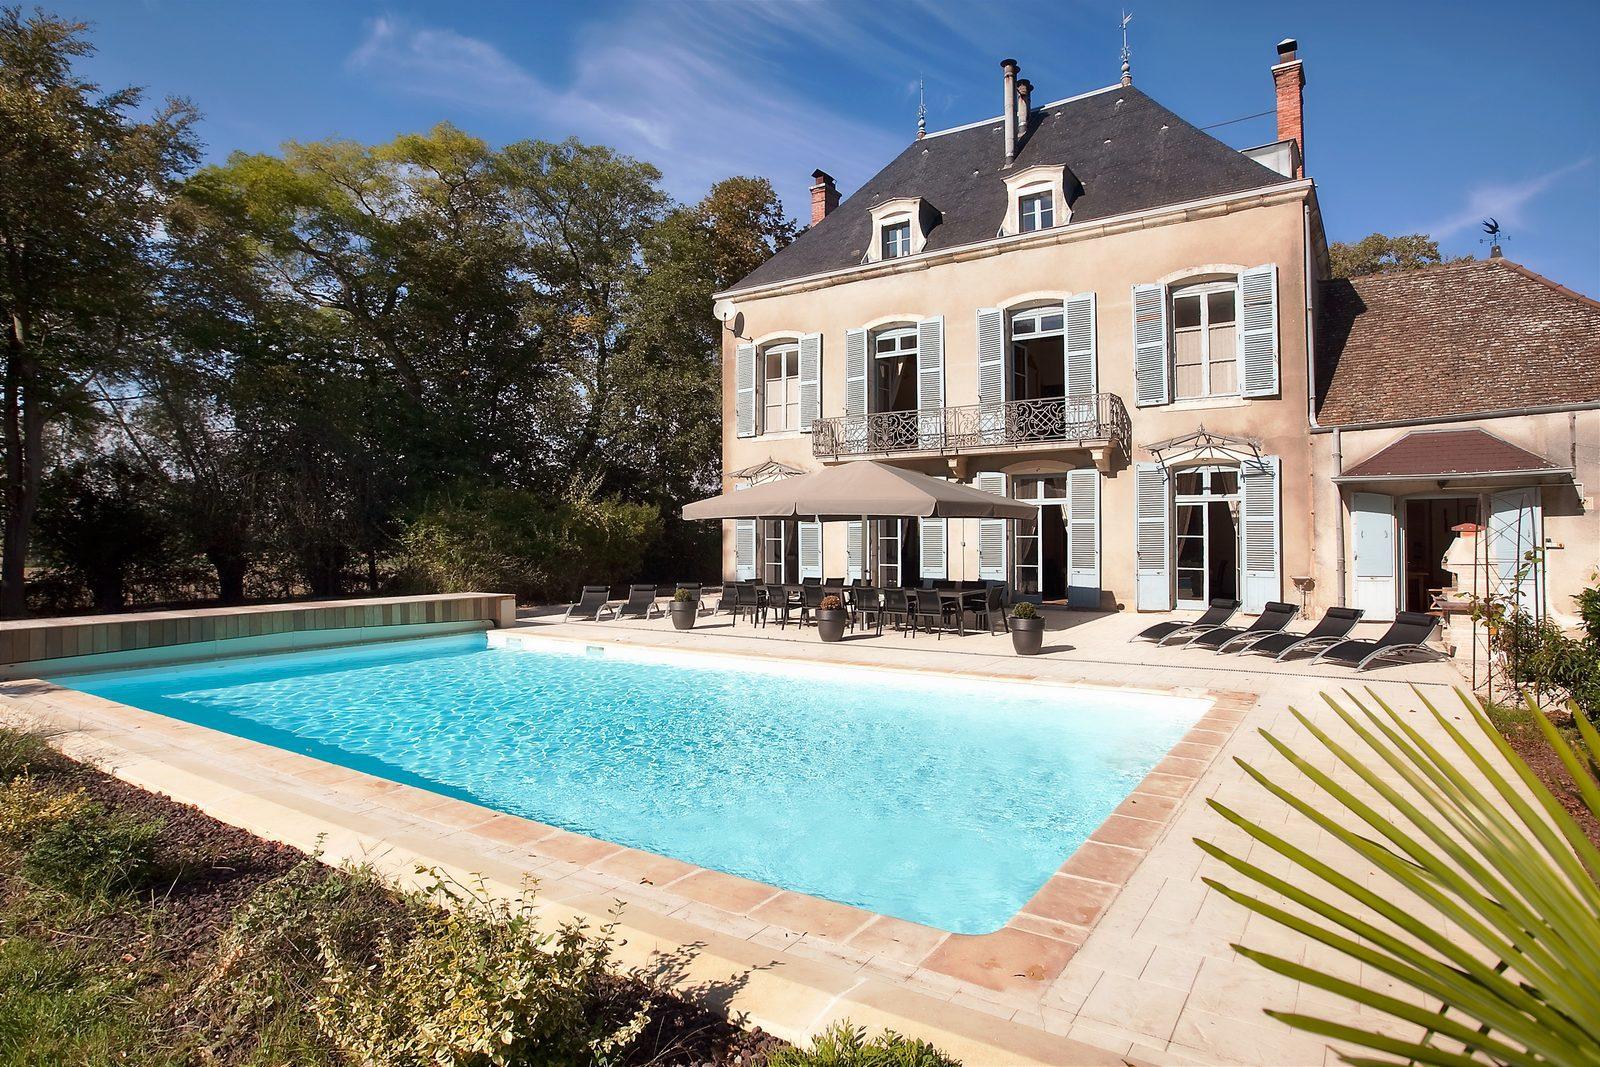 Bourgogne, Lans, le Kastel, les Kasteliades, groot, luxe, vakantievilla, kasteel, chateau, zwembad, sauna, fitness